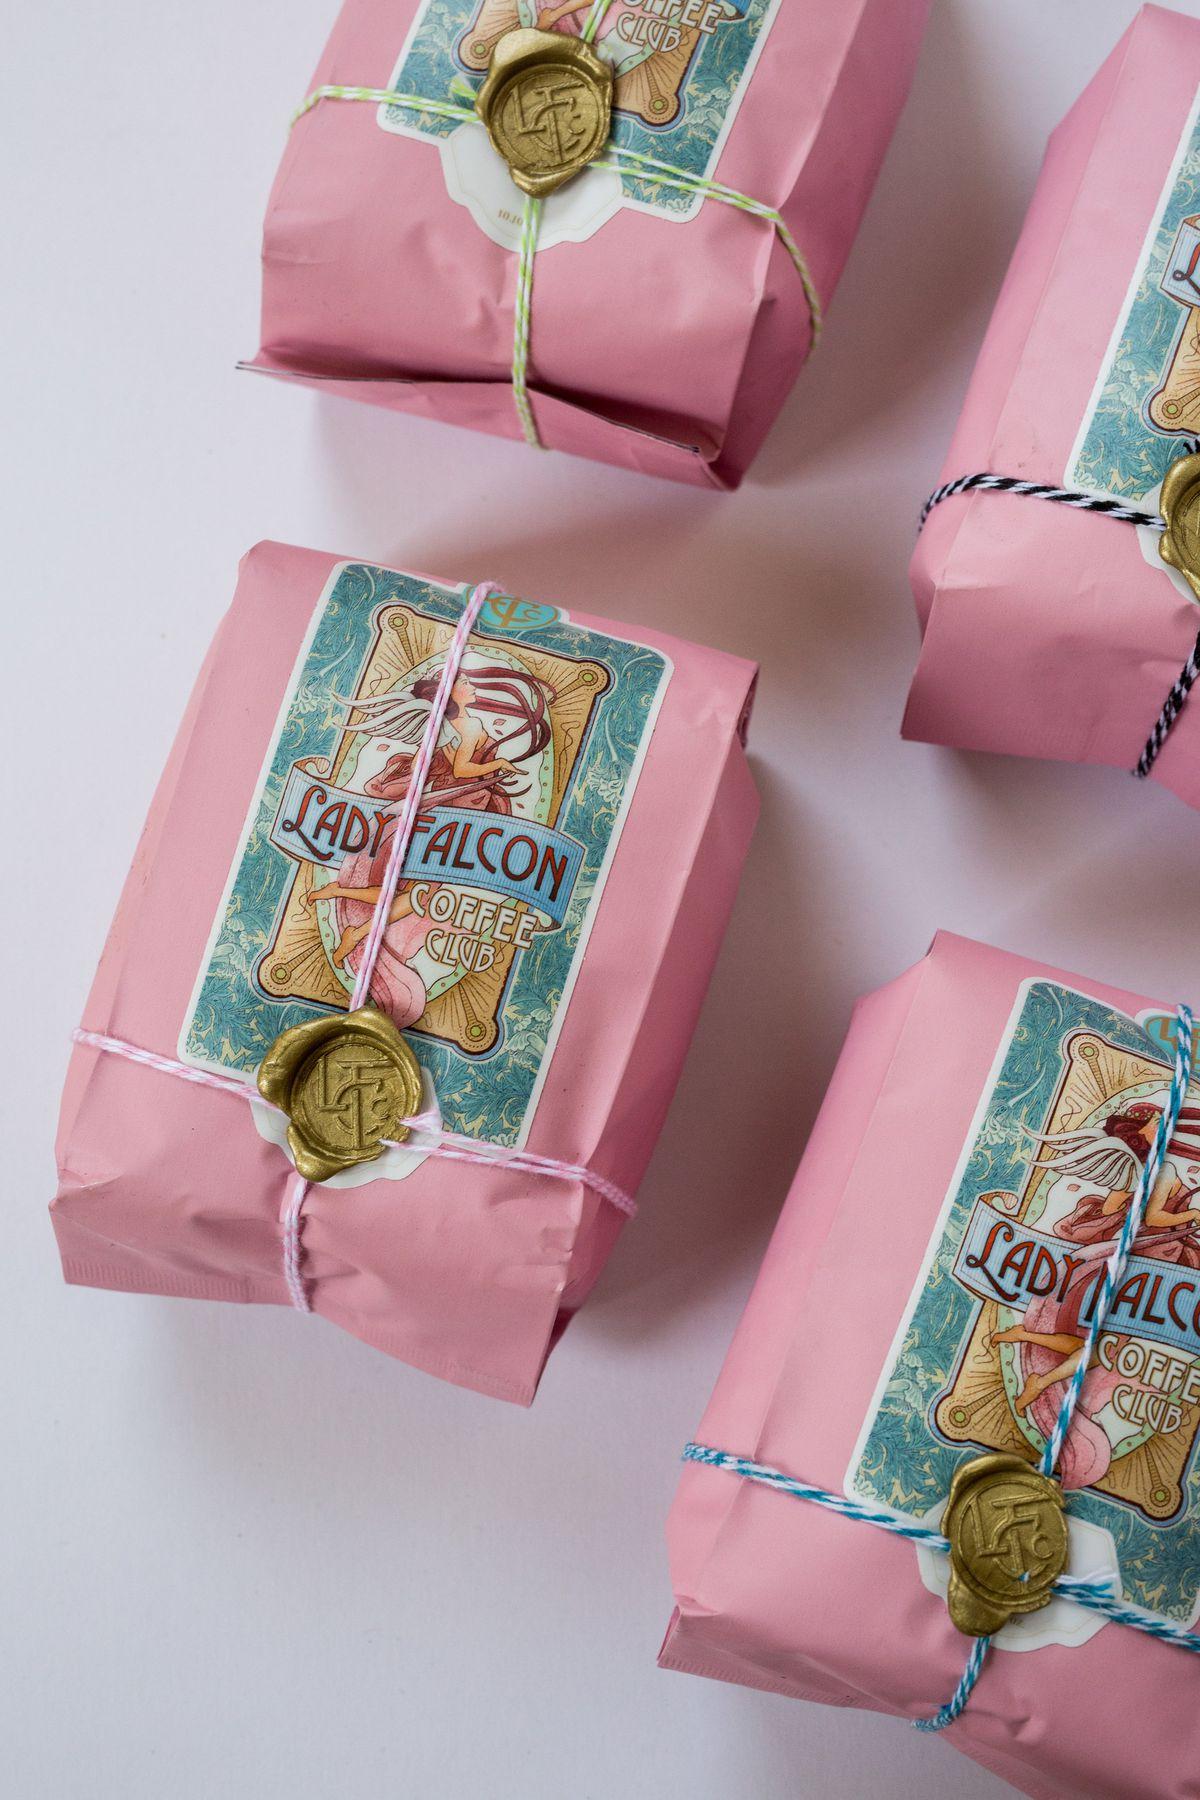 Simone_Anne_Lady_Falcon_Coffee_Club_Packages_36.jpg